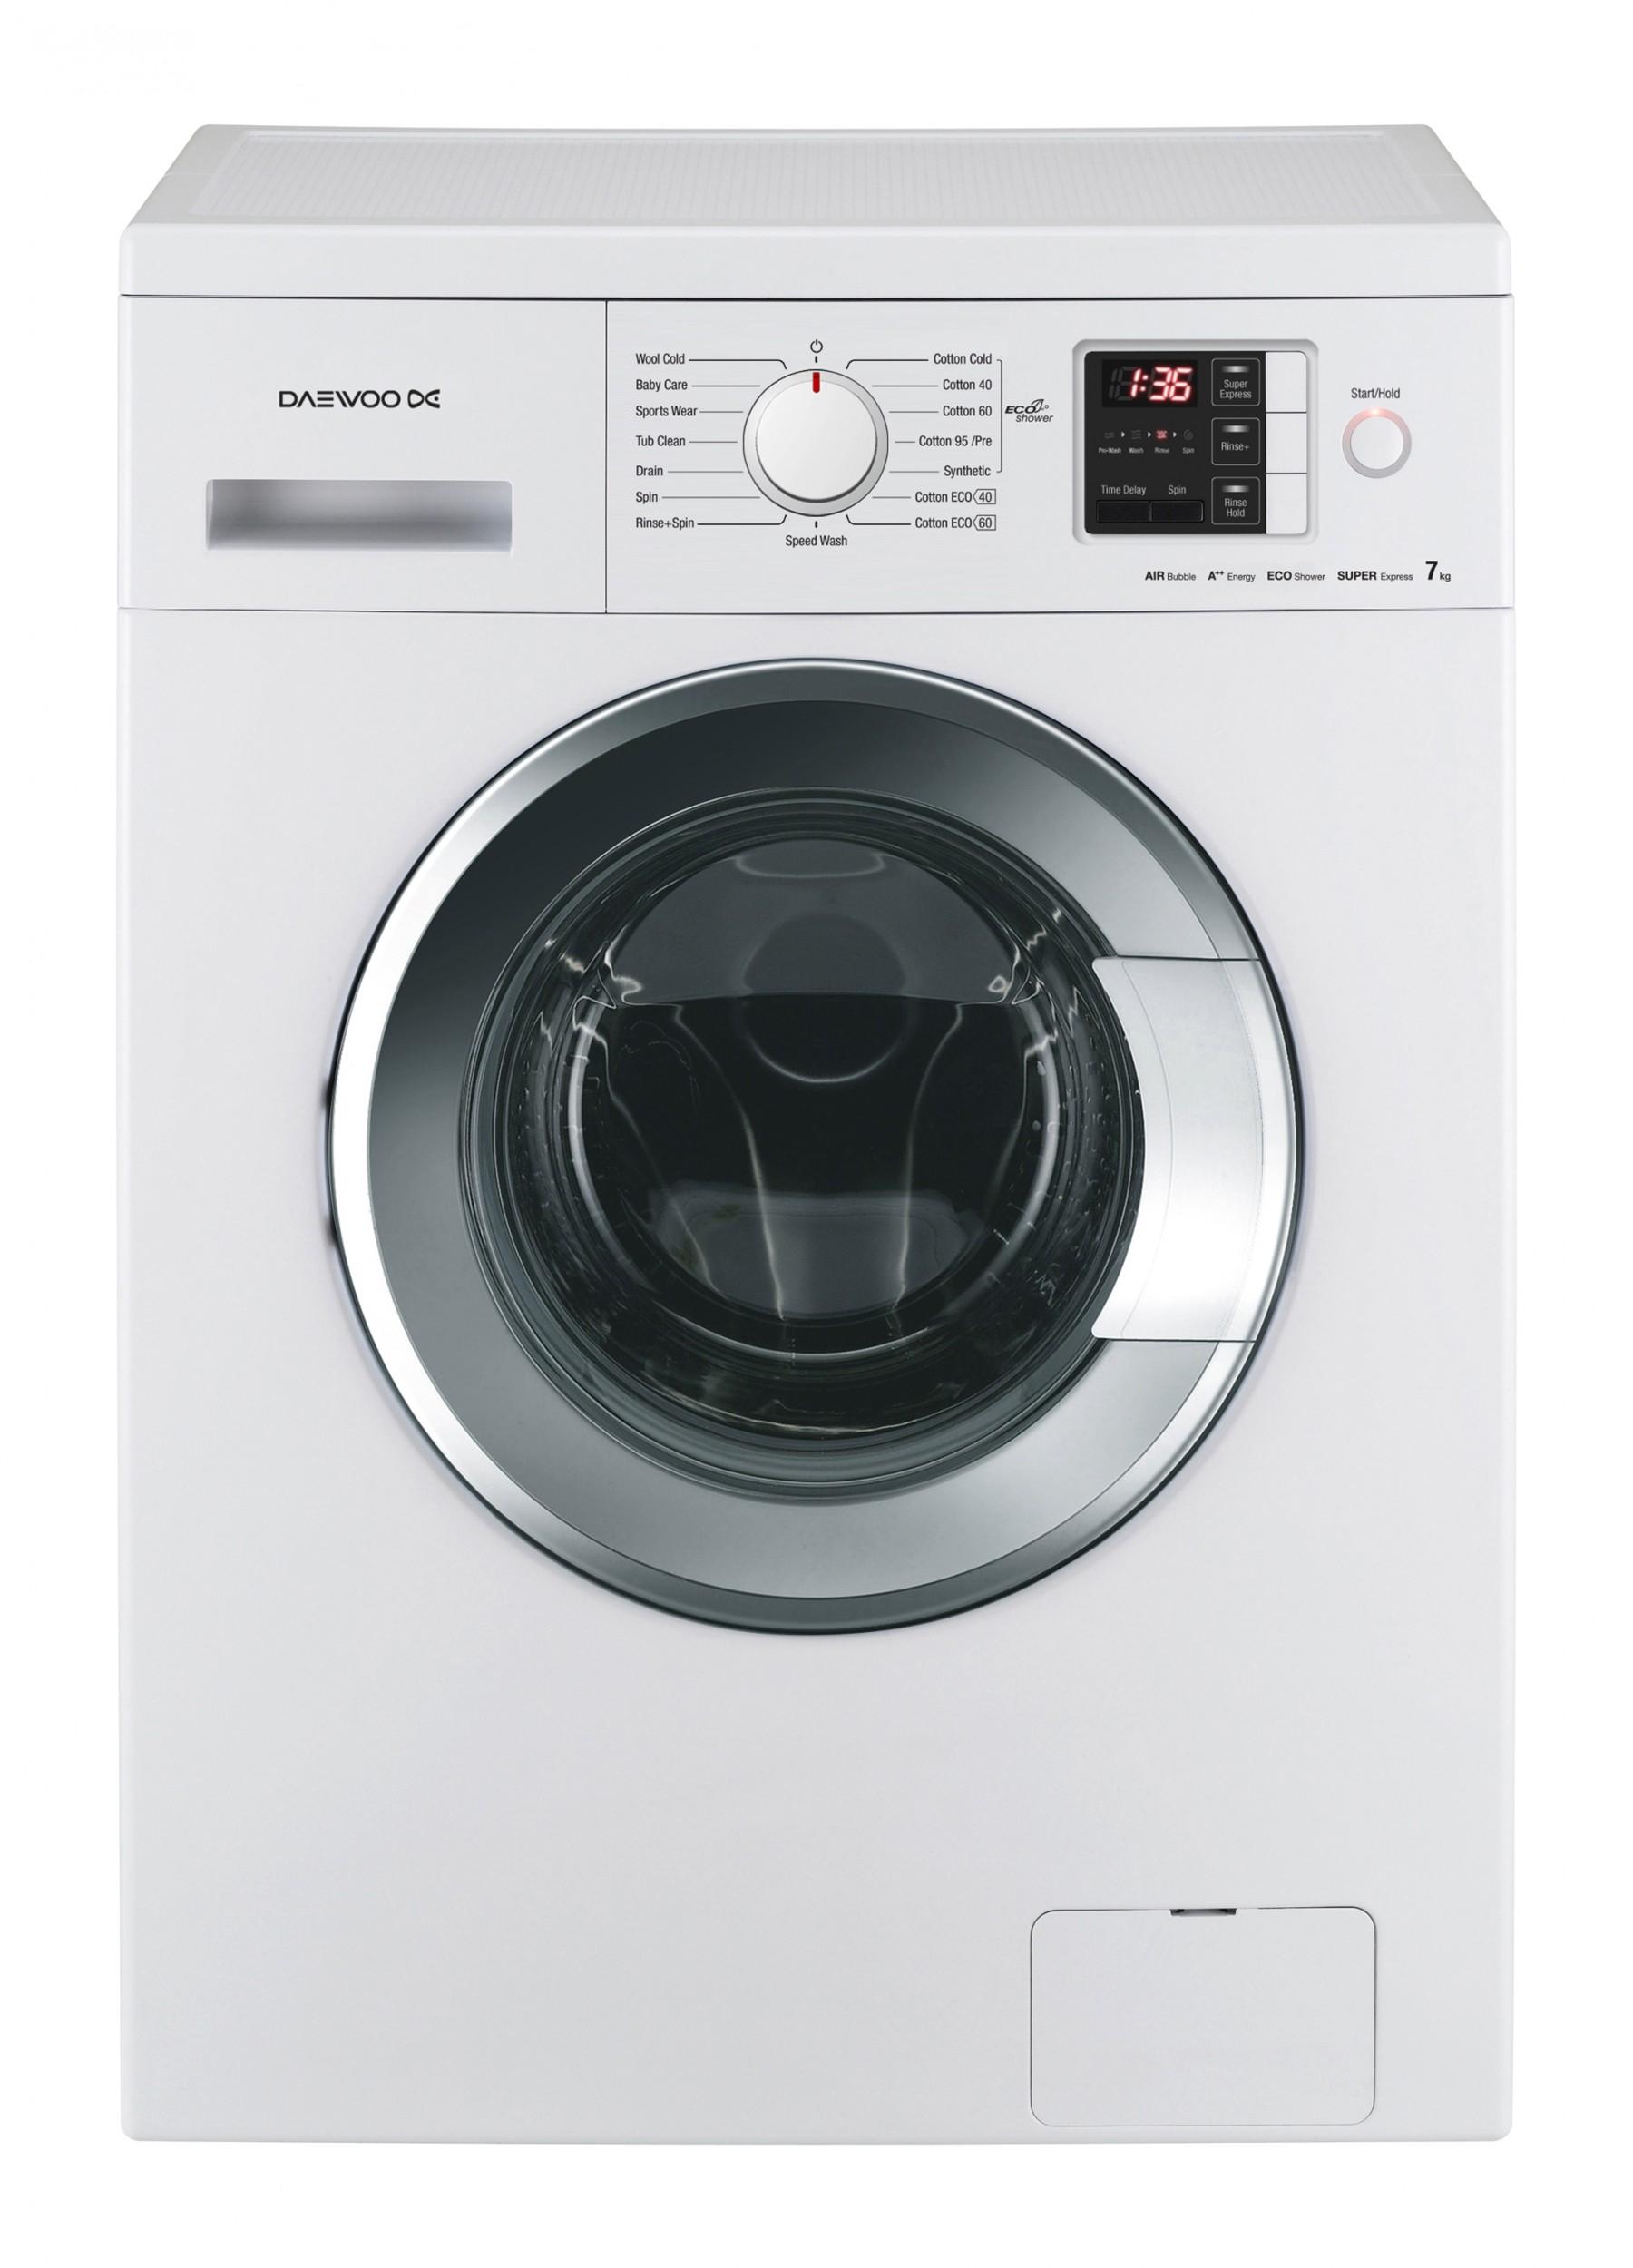 dwd np1222 washing machine 7kg 1200rpm daewoo electronics rh daewooelectronics eu Daewoo Steam Washer Daewoo Washer and Dryer